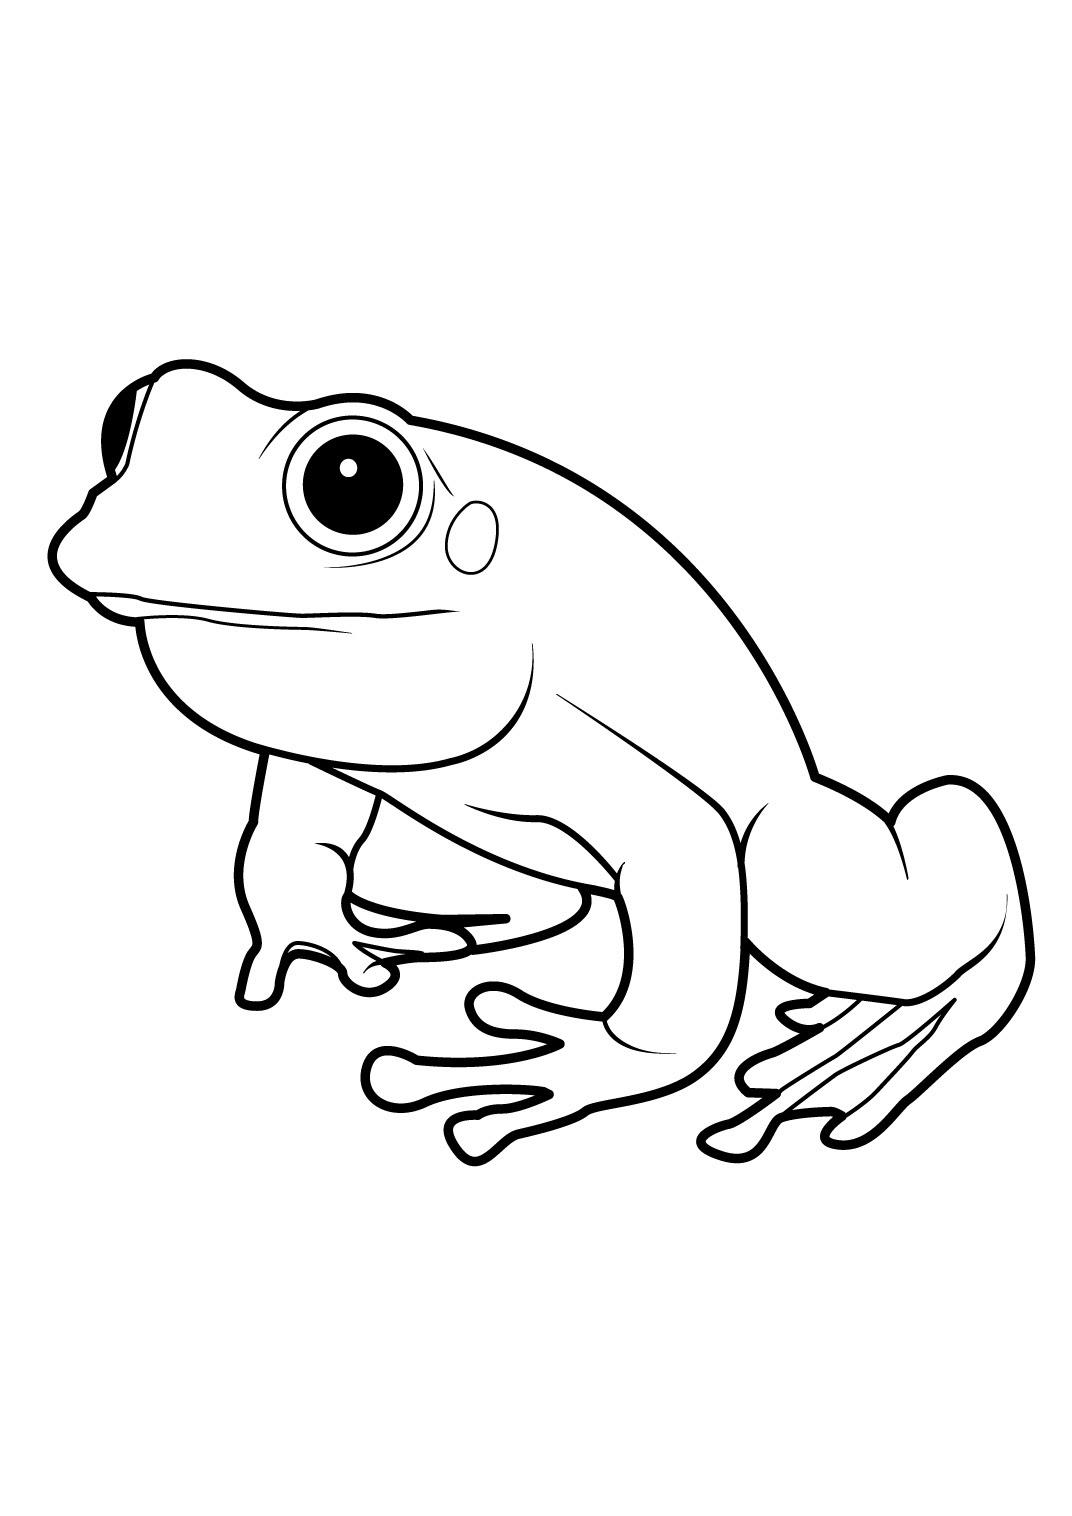 Coloriage grenouille  imprimer dessin de grenouille